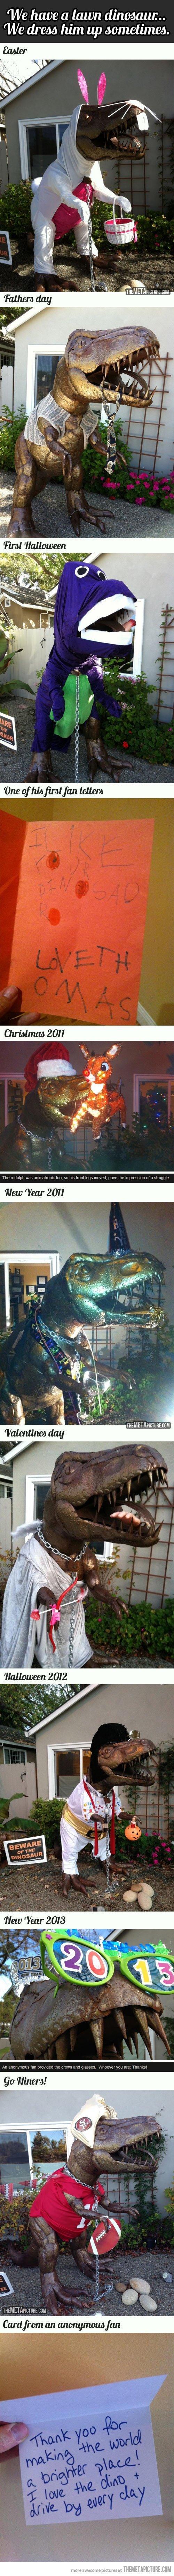 Lawn Dinosaur. . Behaved lawn dinsaur... We drew him . New 'Year era. Where does one acquire a lawn dinosaur?